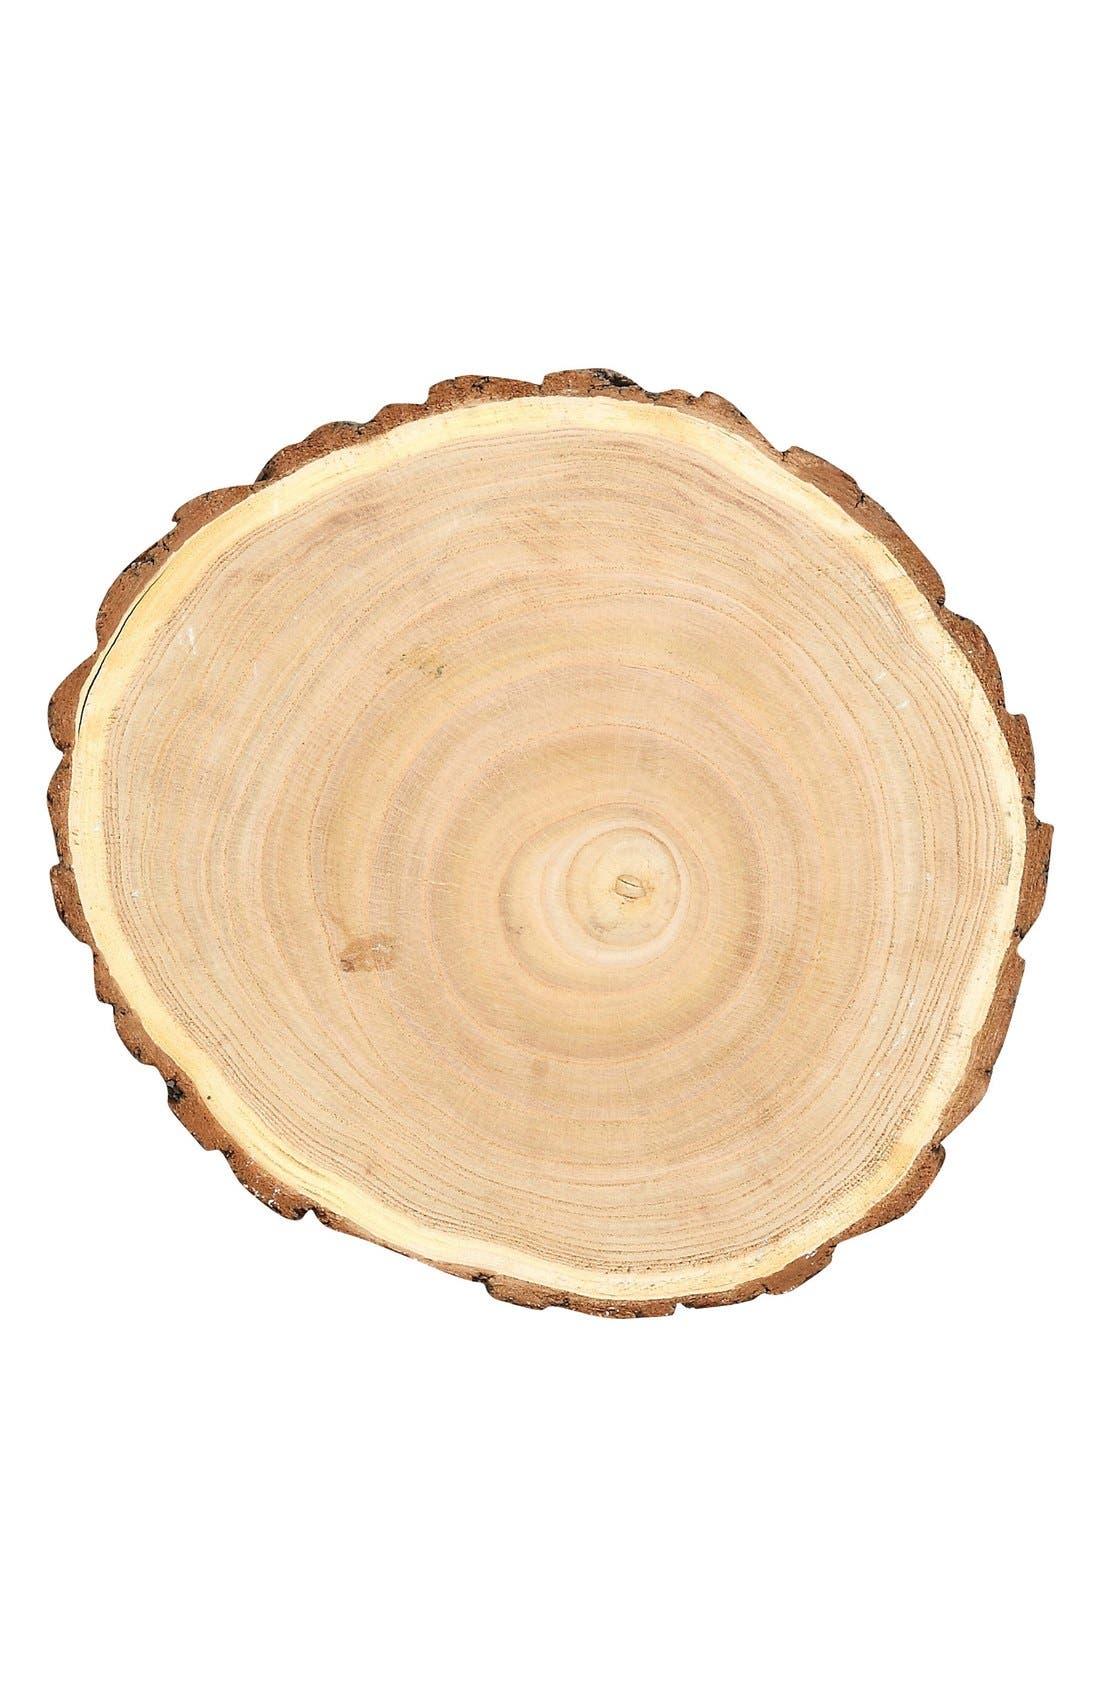 Round Wood Slice,                             Alternate thumbnail 2, color,                             200